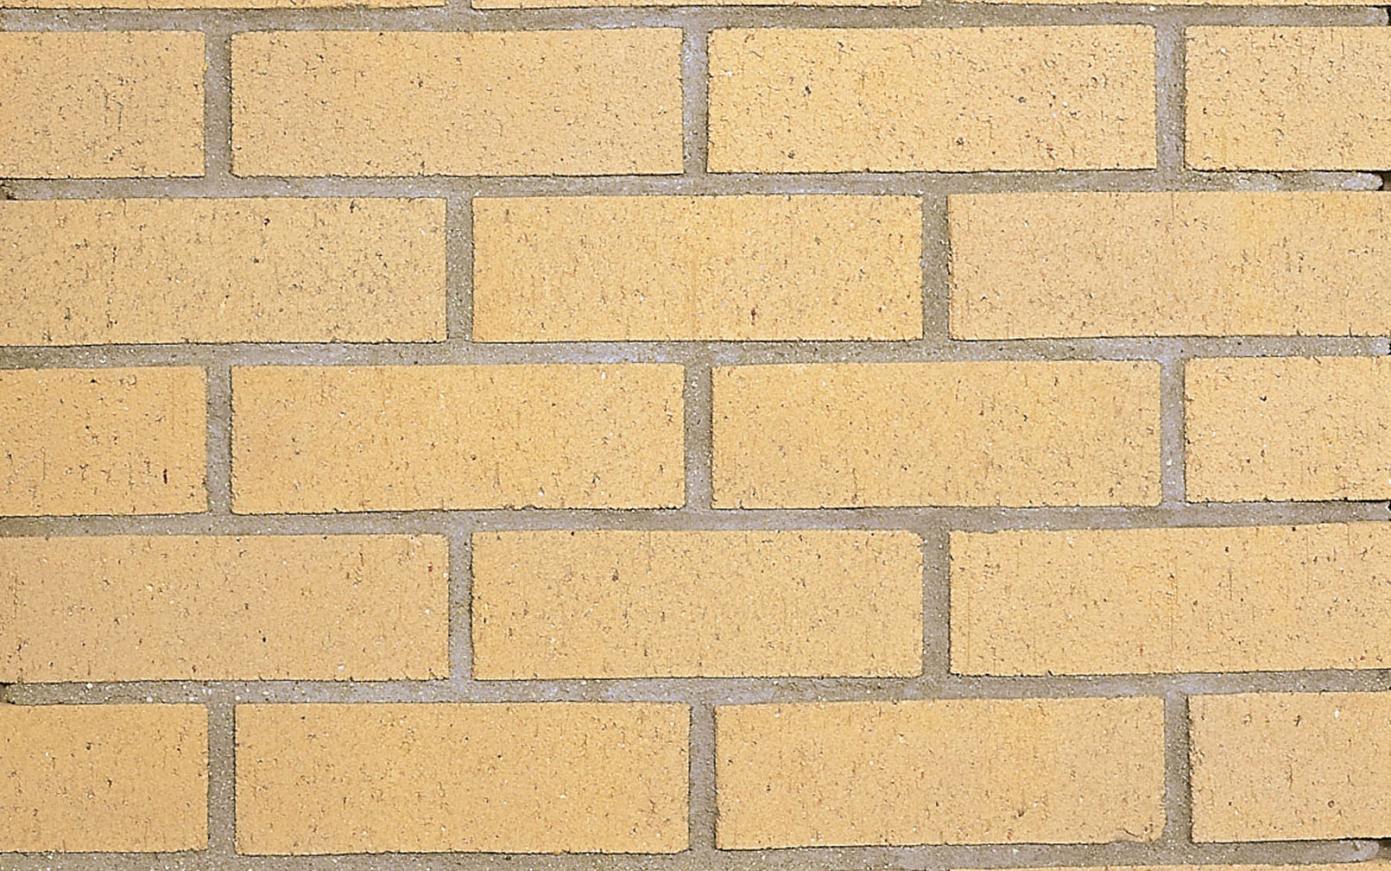 Fire Brick Red : Fire brick h c muddox